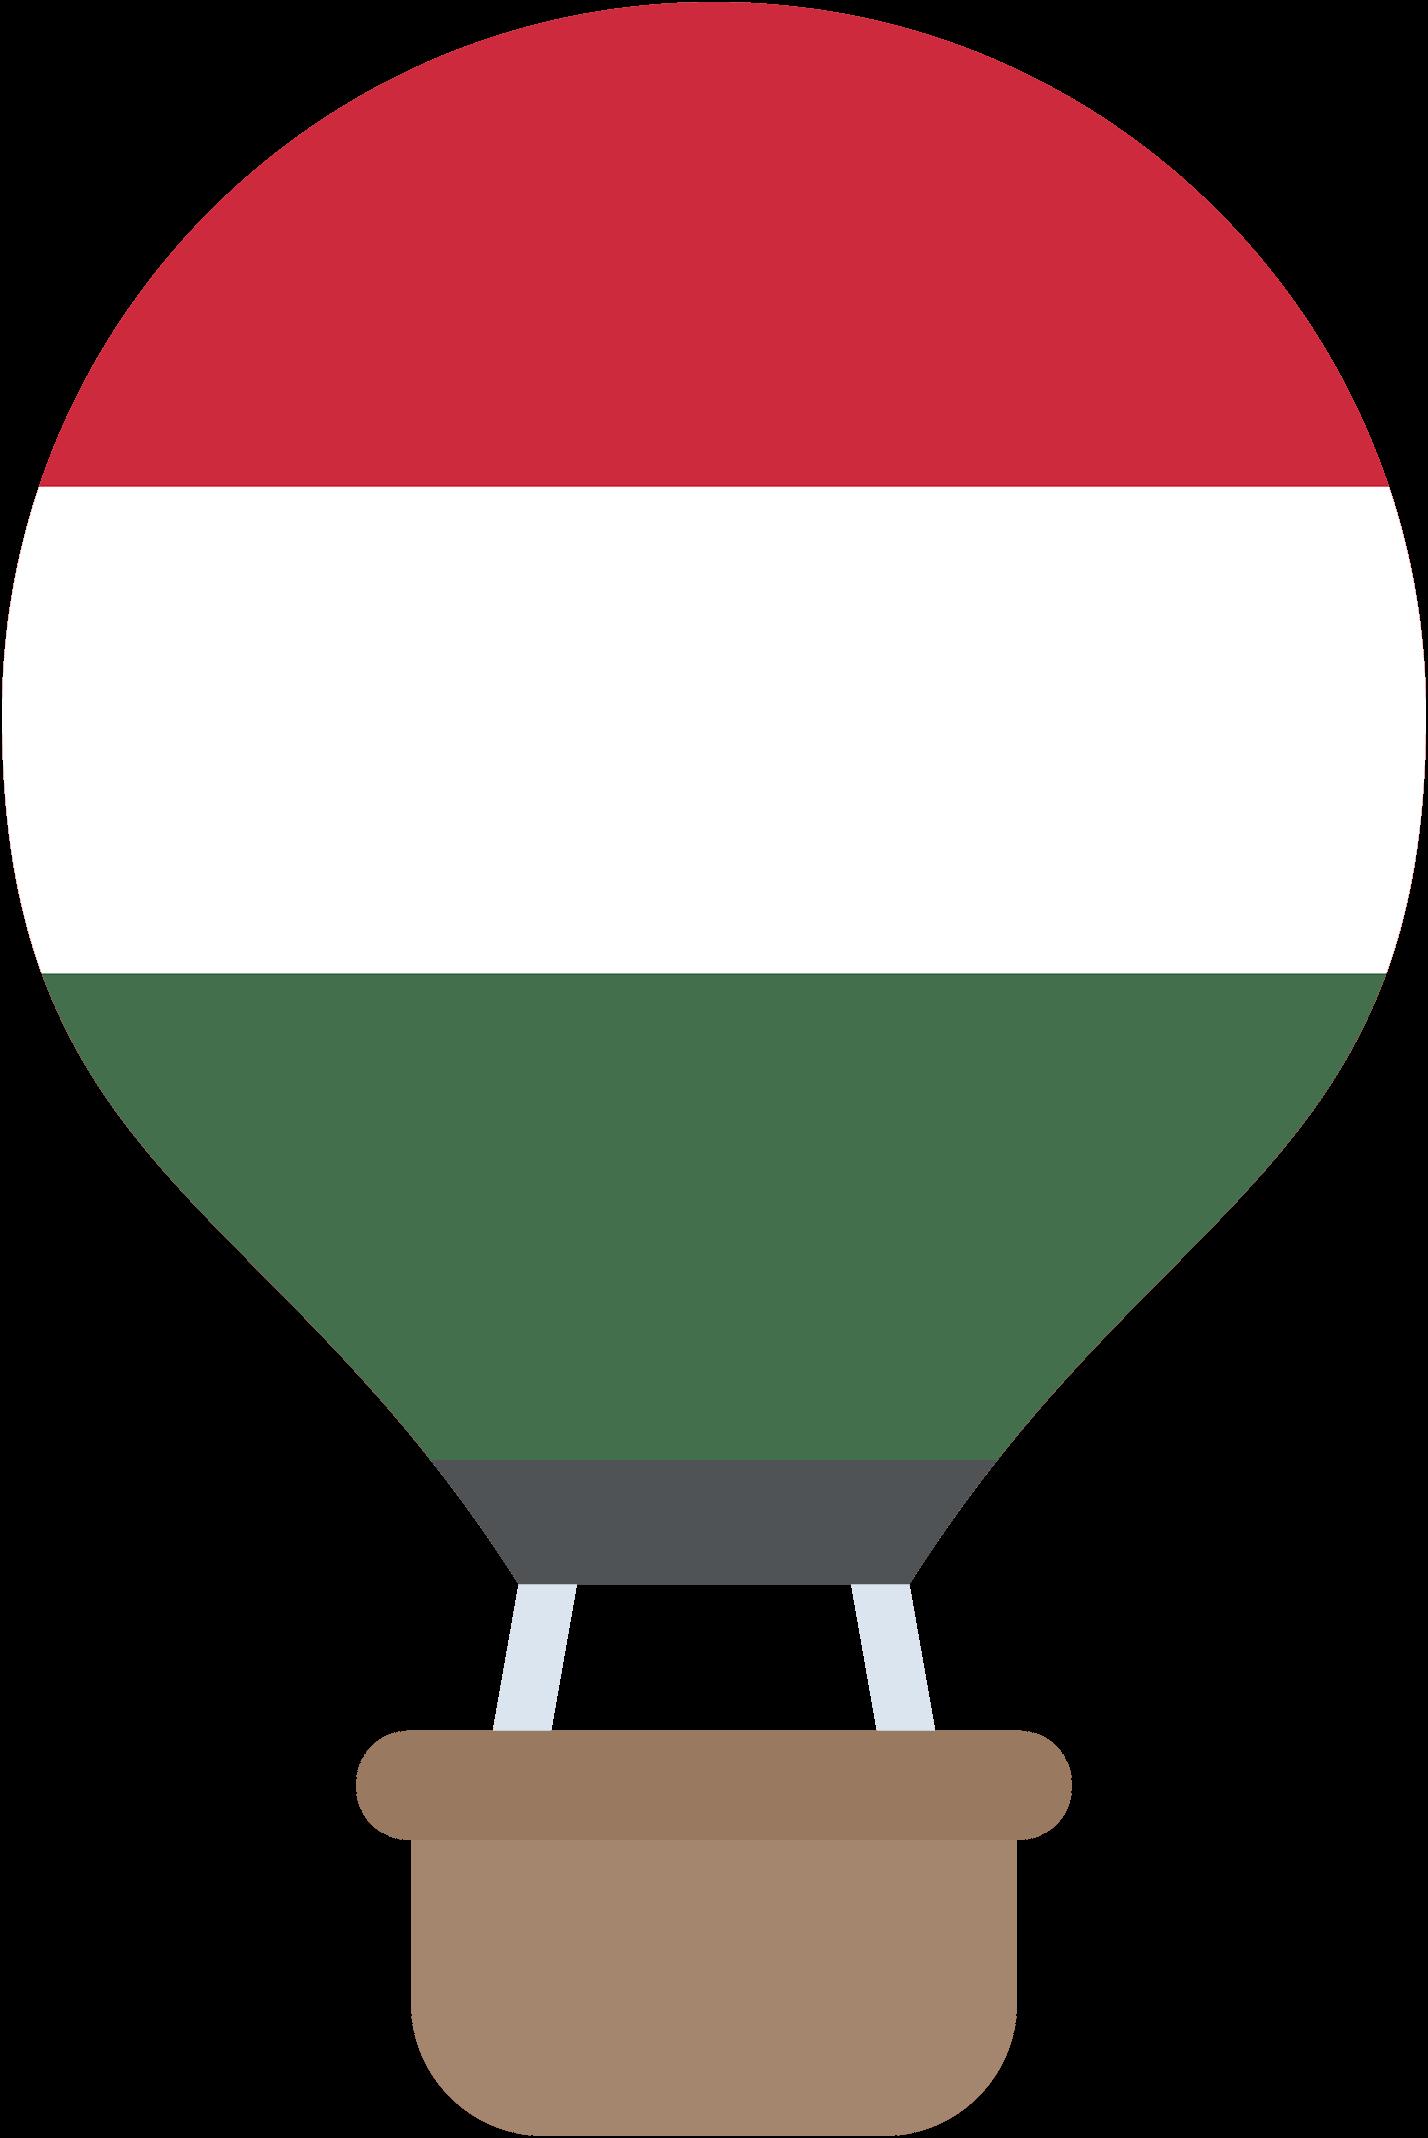 hőlégballon piros-fehér-zöld magyar nyelvű gyerekműsor